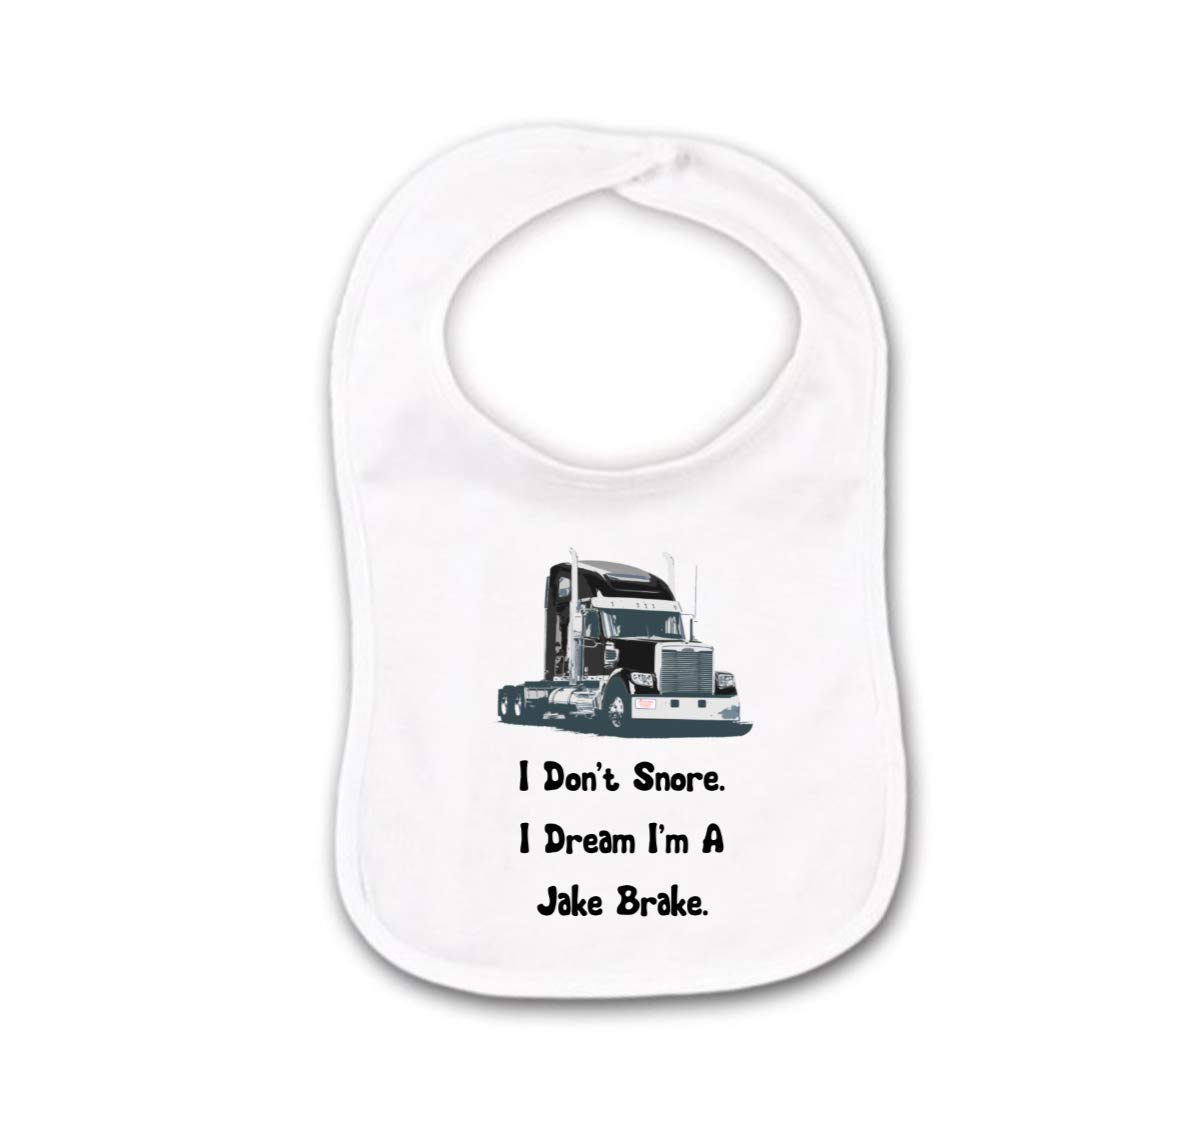 Semi Truck Driver Baby Bib or Burp Cloth For Daddys 18 Eighteen Wheeler Buddy Jake Break